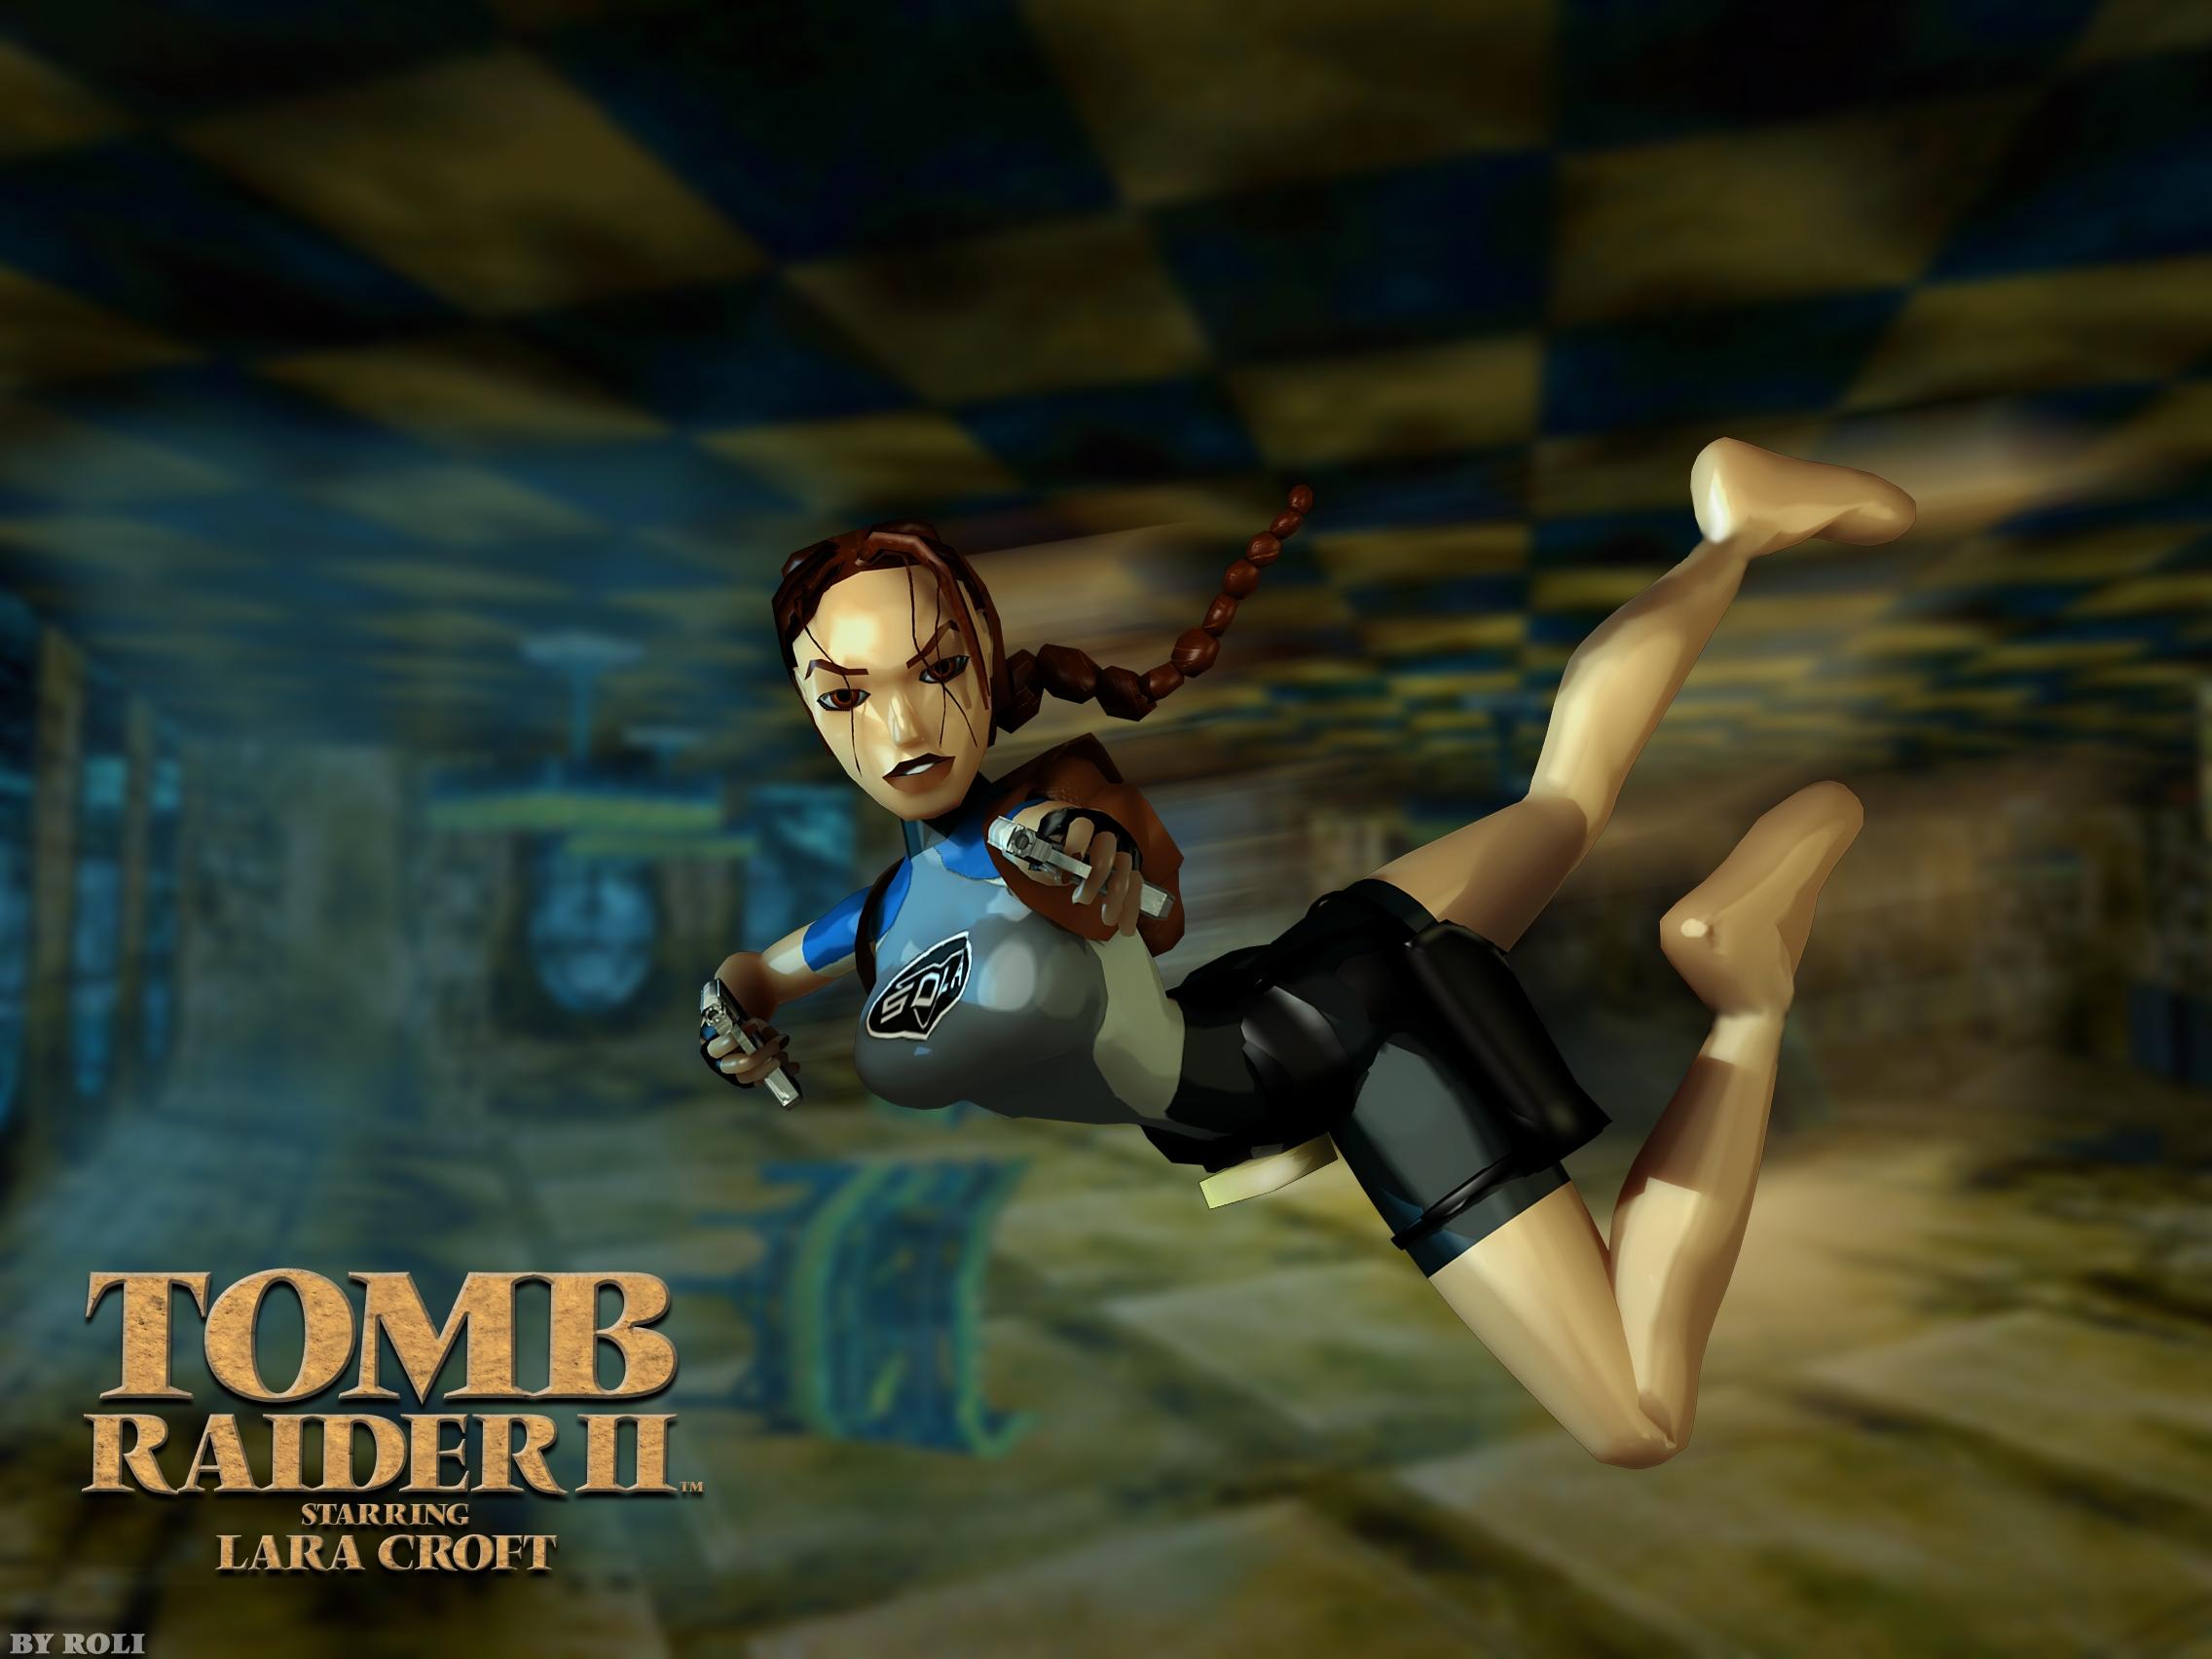 Tomb Raiders, Tomb Raider